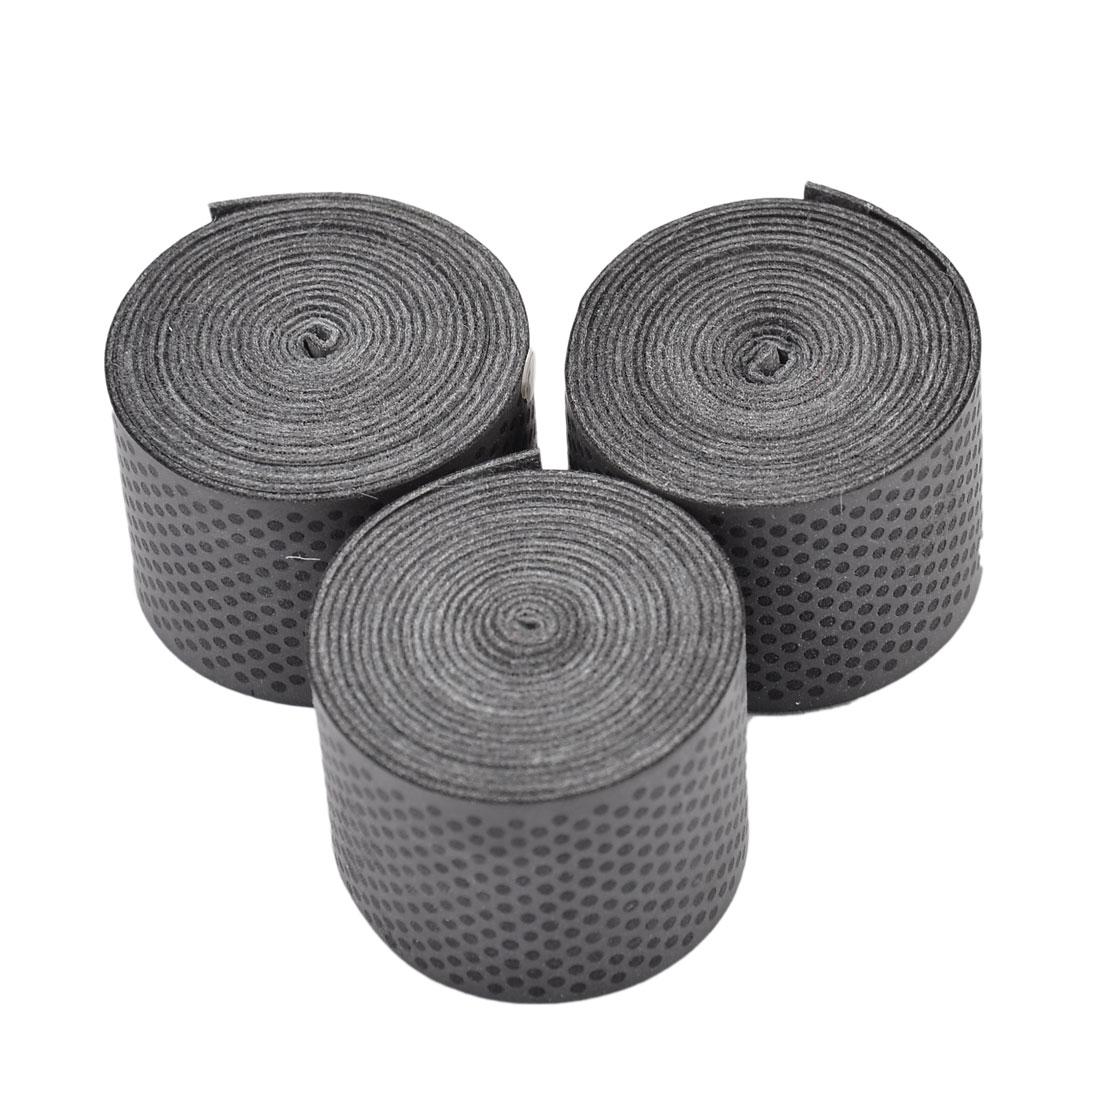 Badminton Foam Racket Sweat Absorbing Wrap Over Grip Tape Black 110 x 2.4cm 3 Pcs